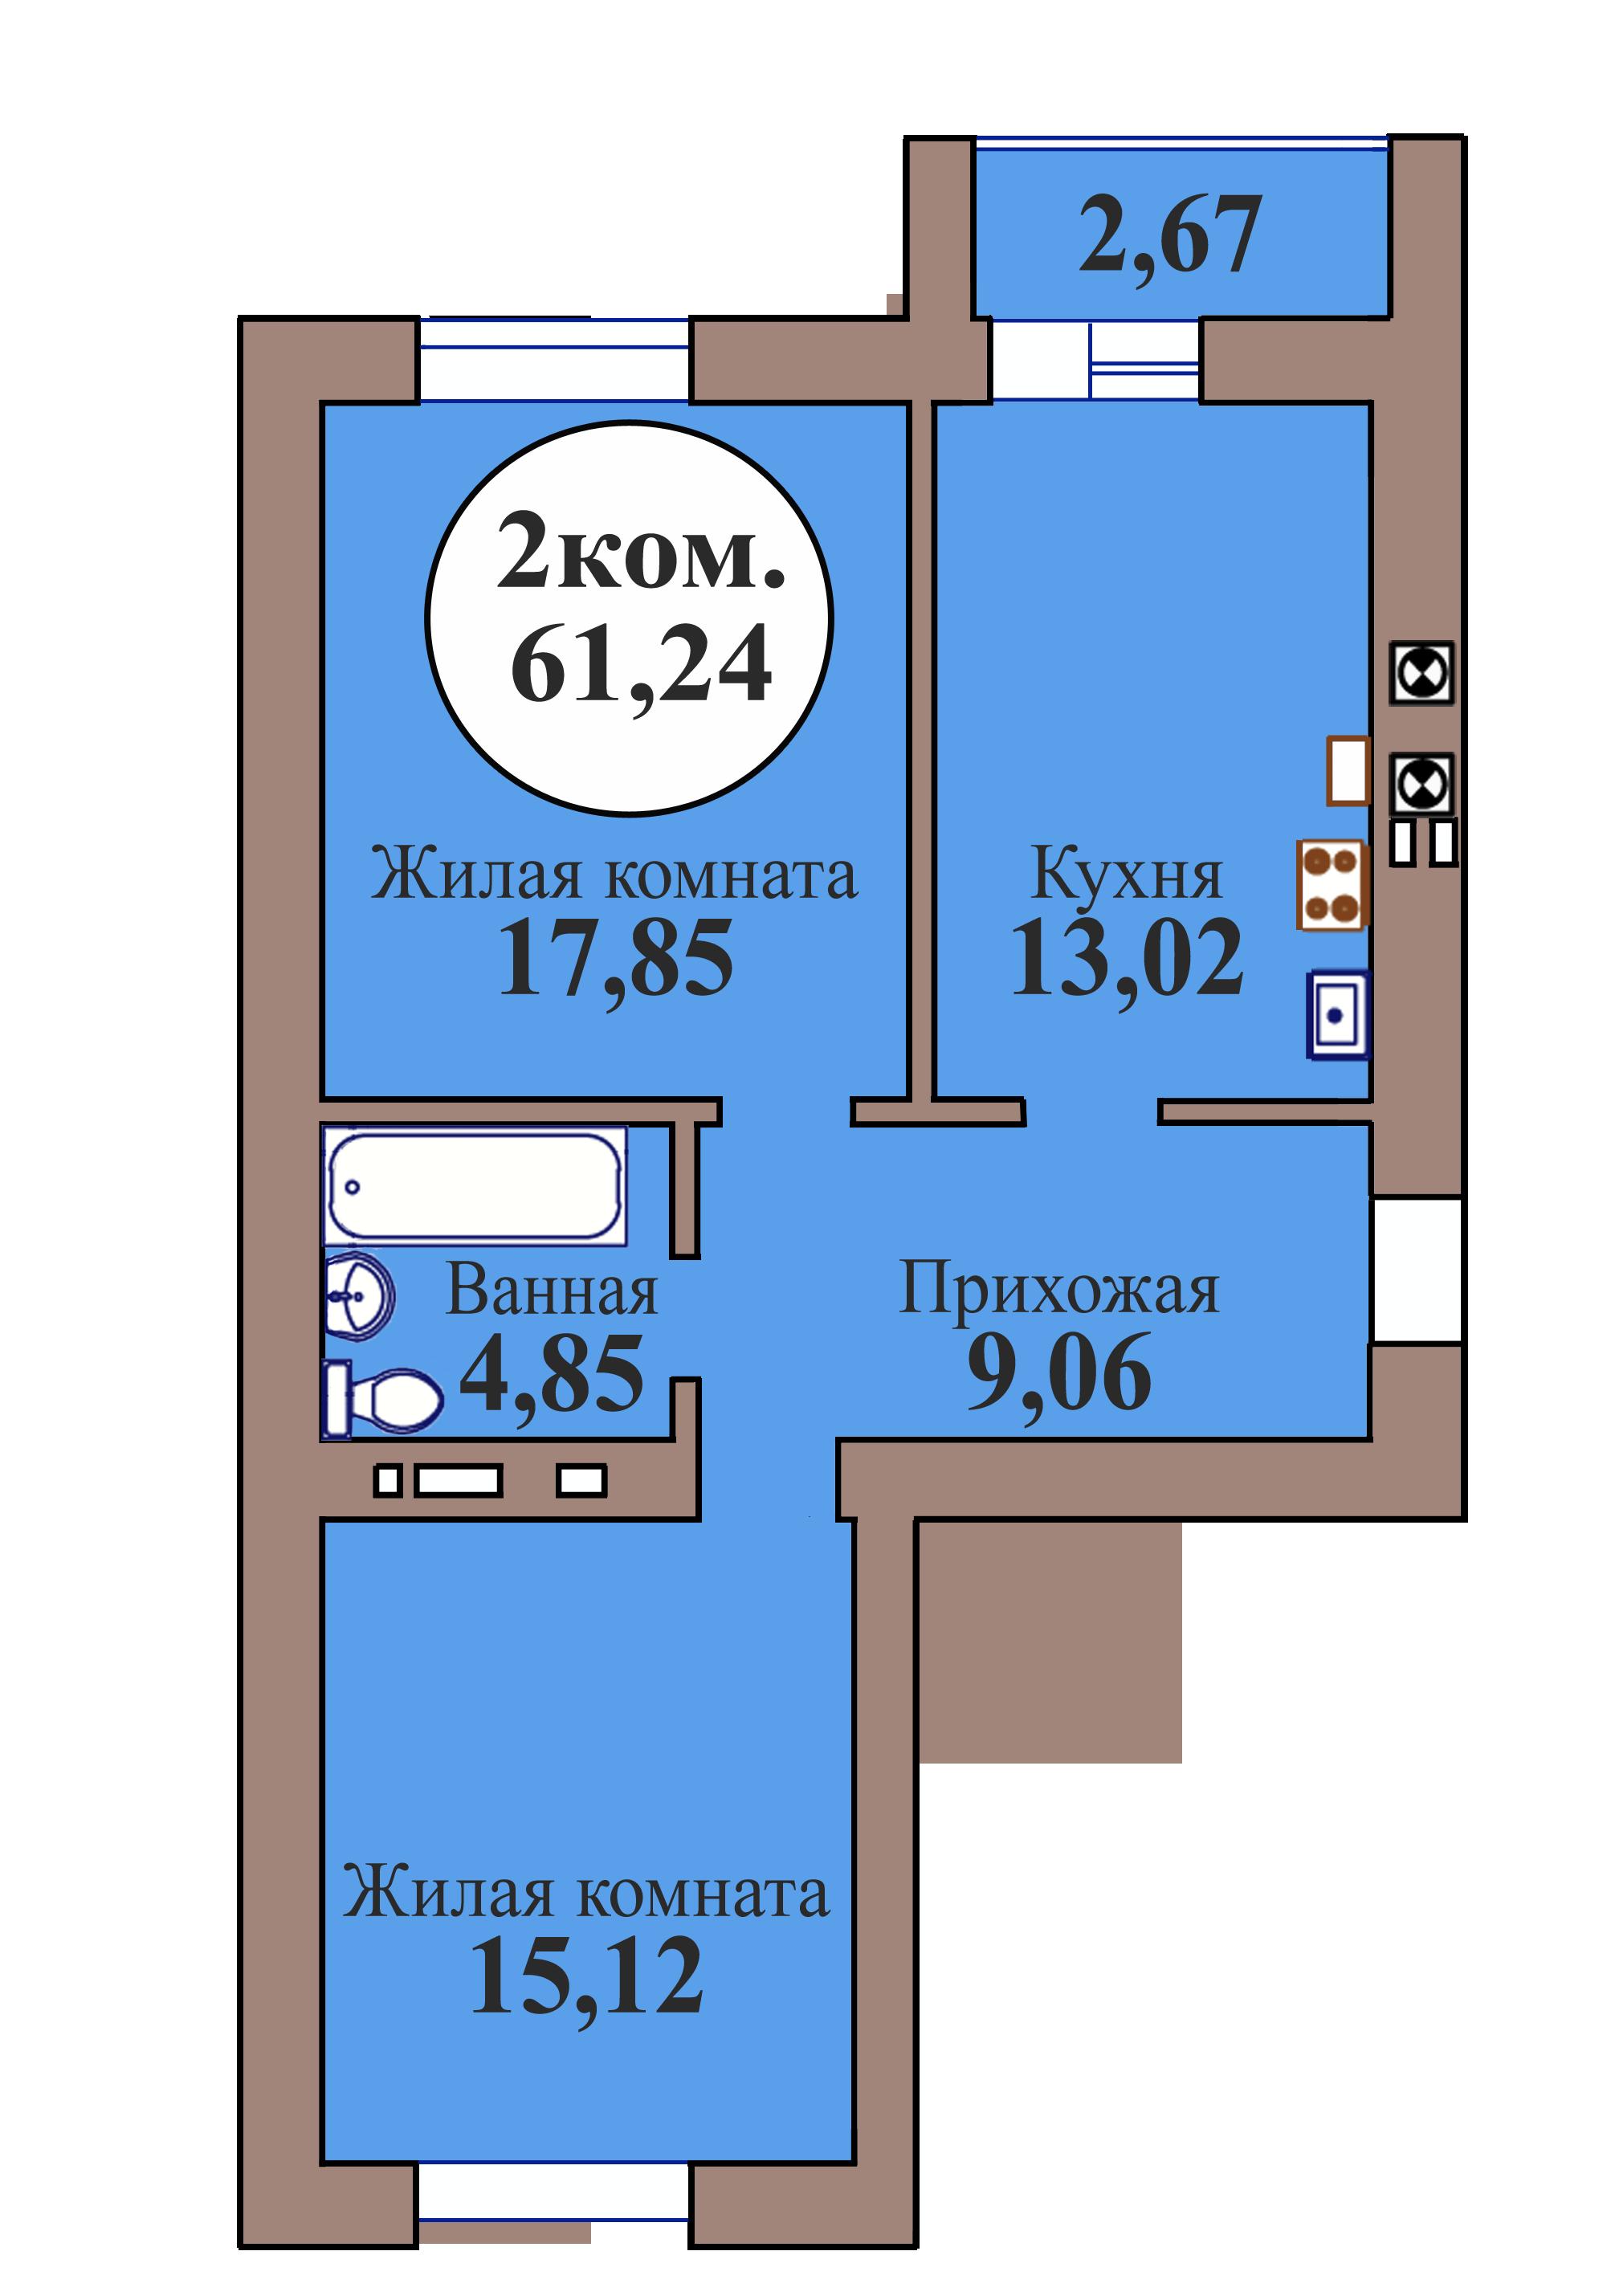 2-комн. кв. по пер. Калининградский, 5 кв. 151 в Калининграде